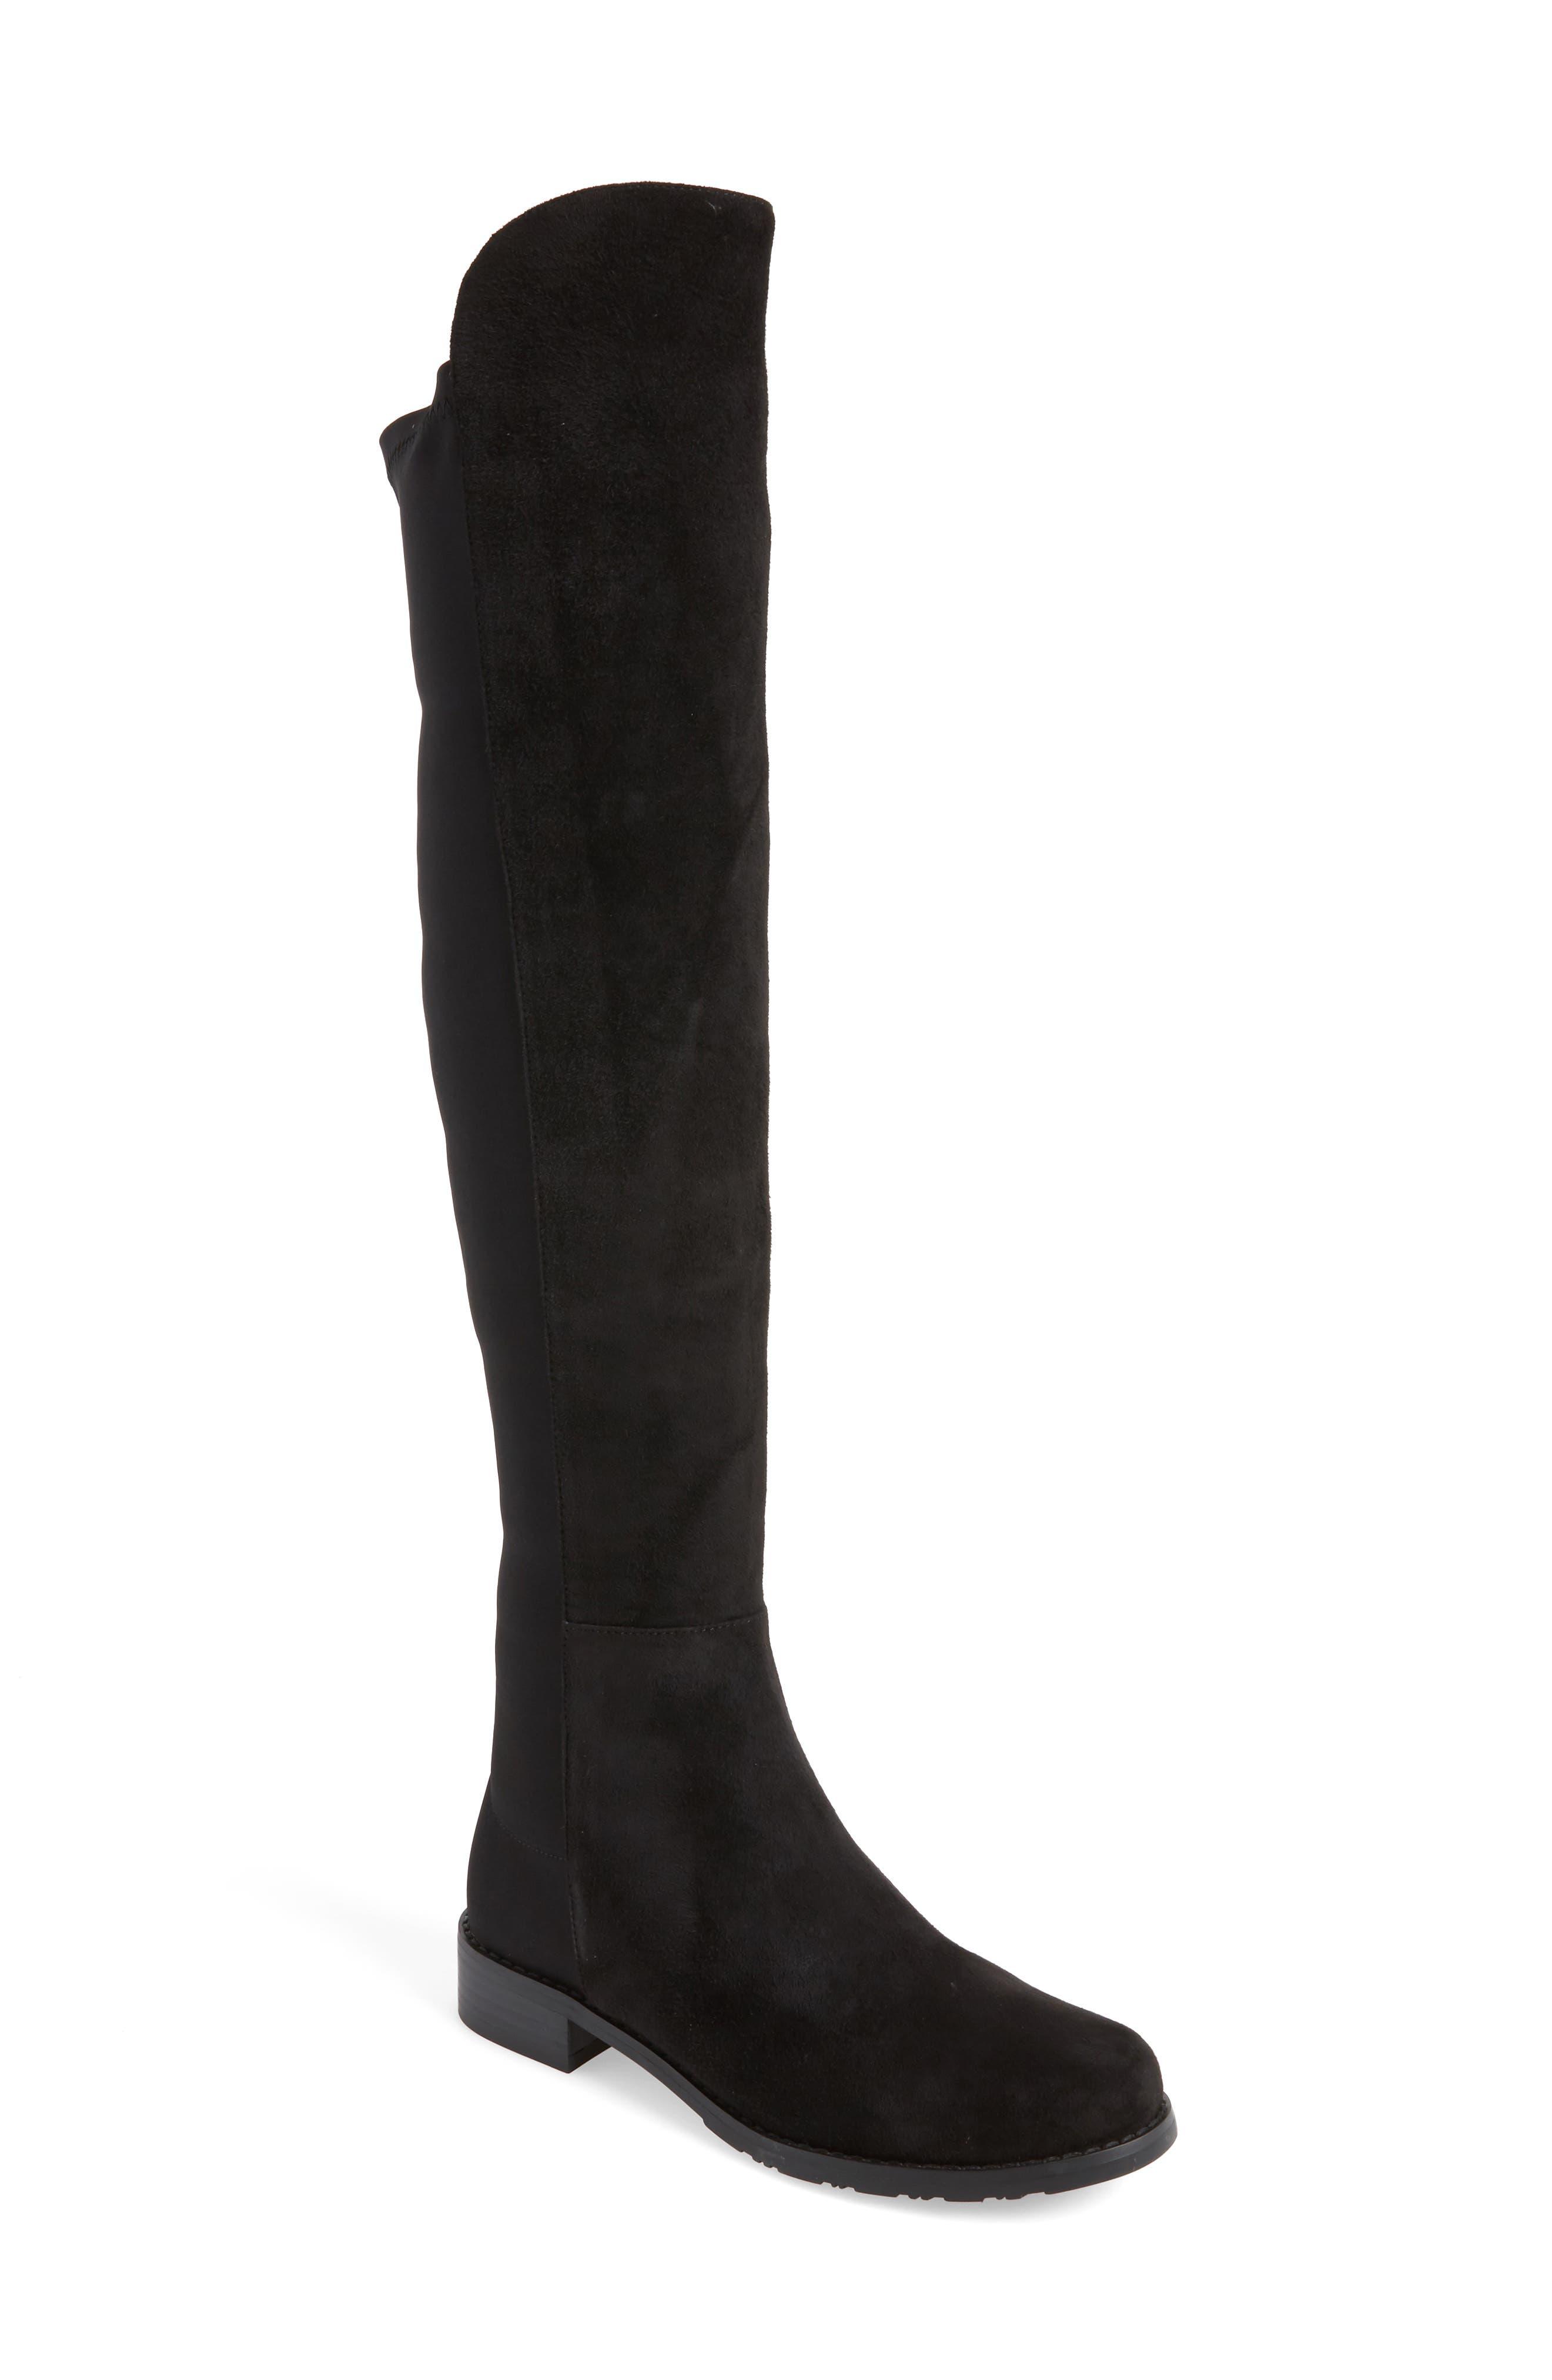 Panache Tall Boot,                         Main,                         color,